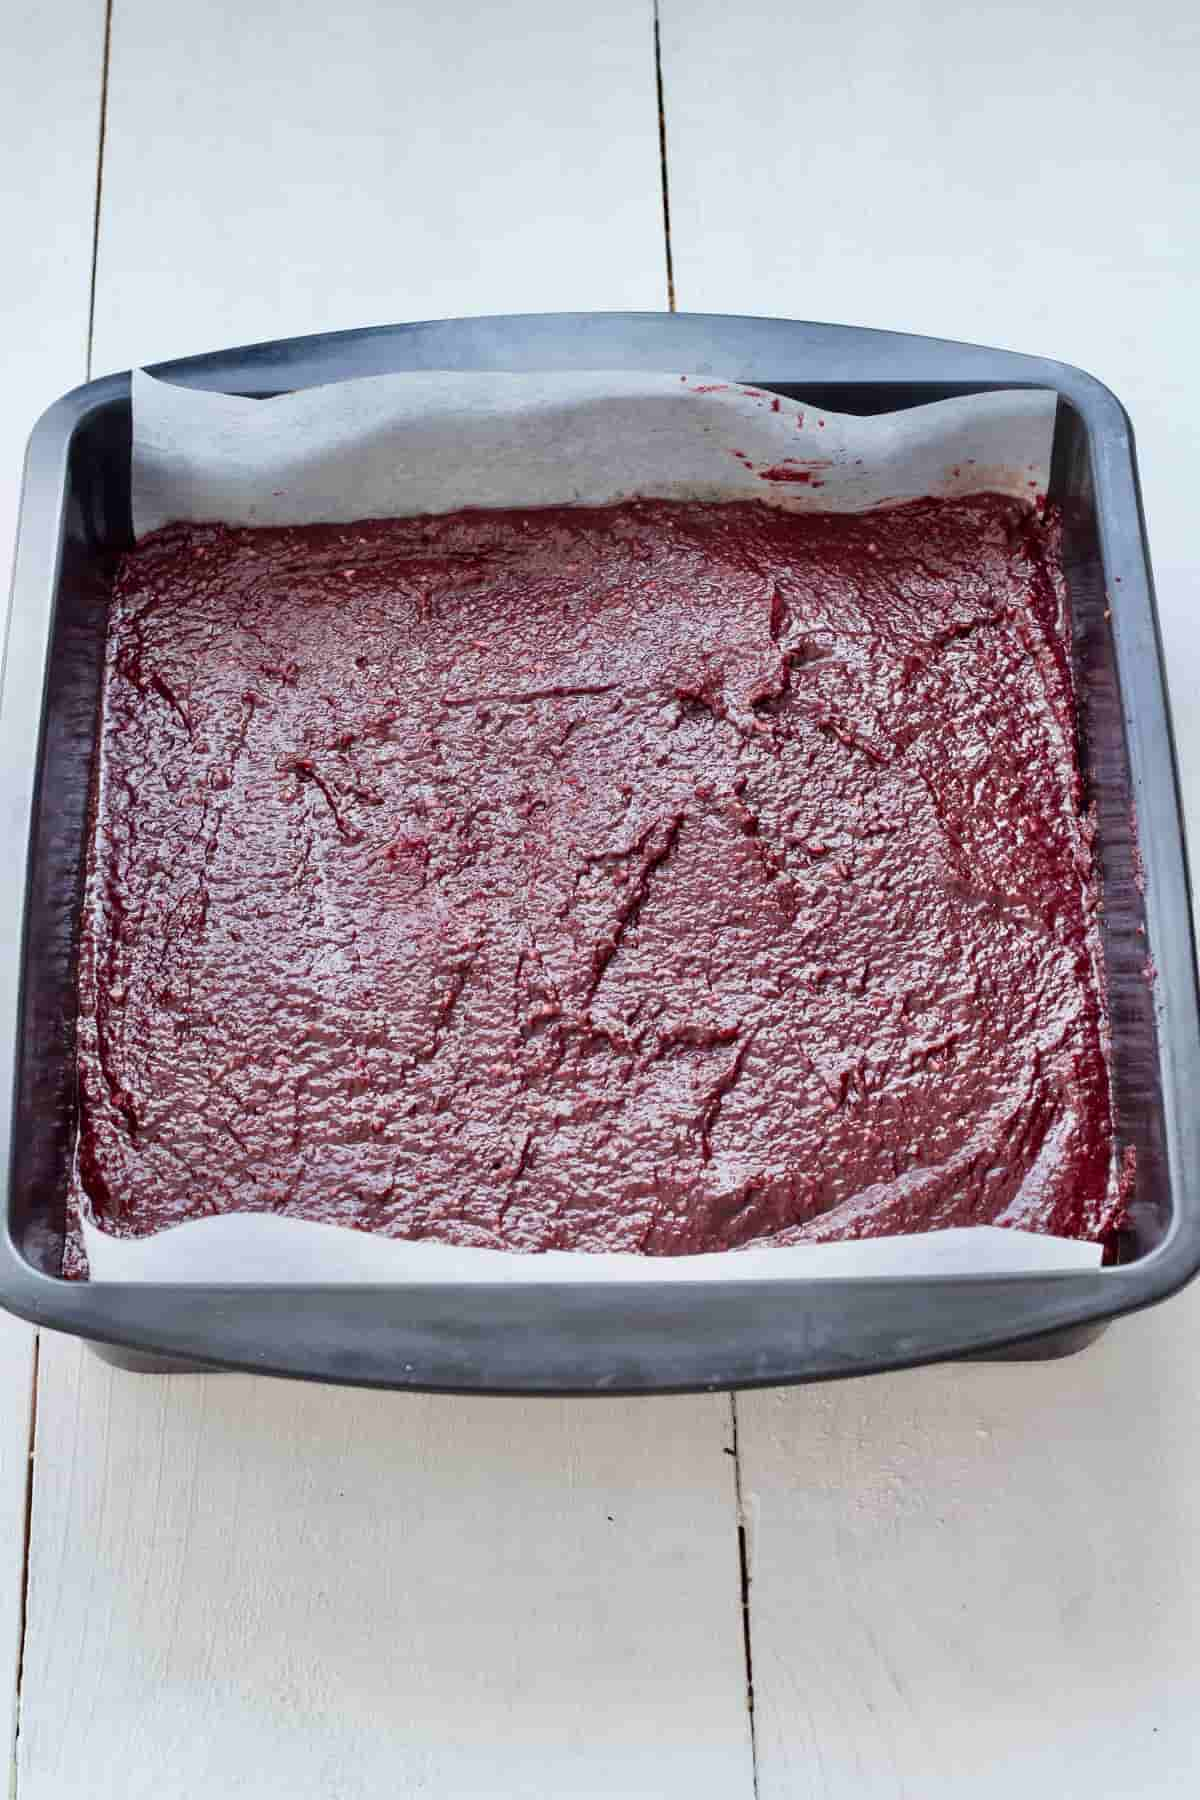 Vegan beetroot brownies in a tin before baking.